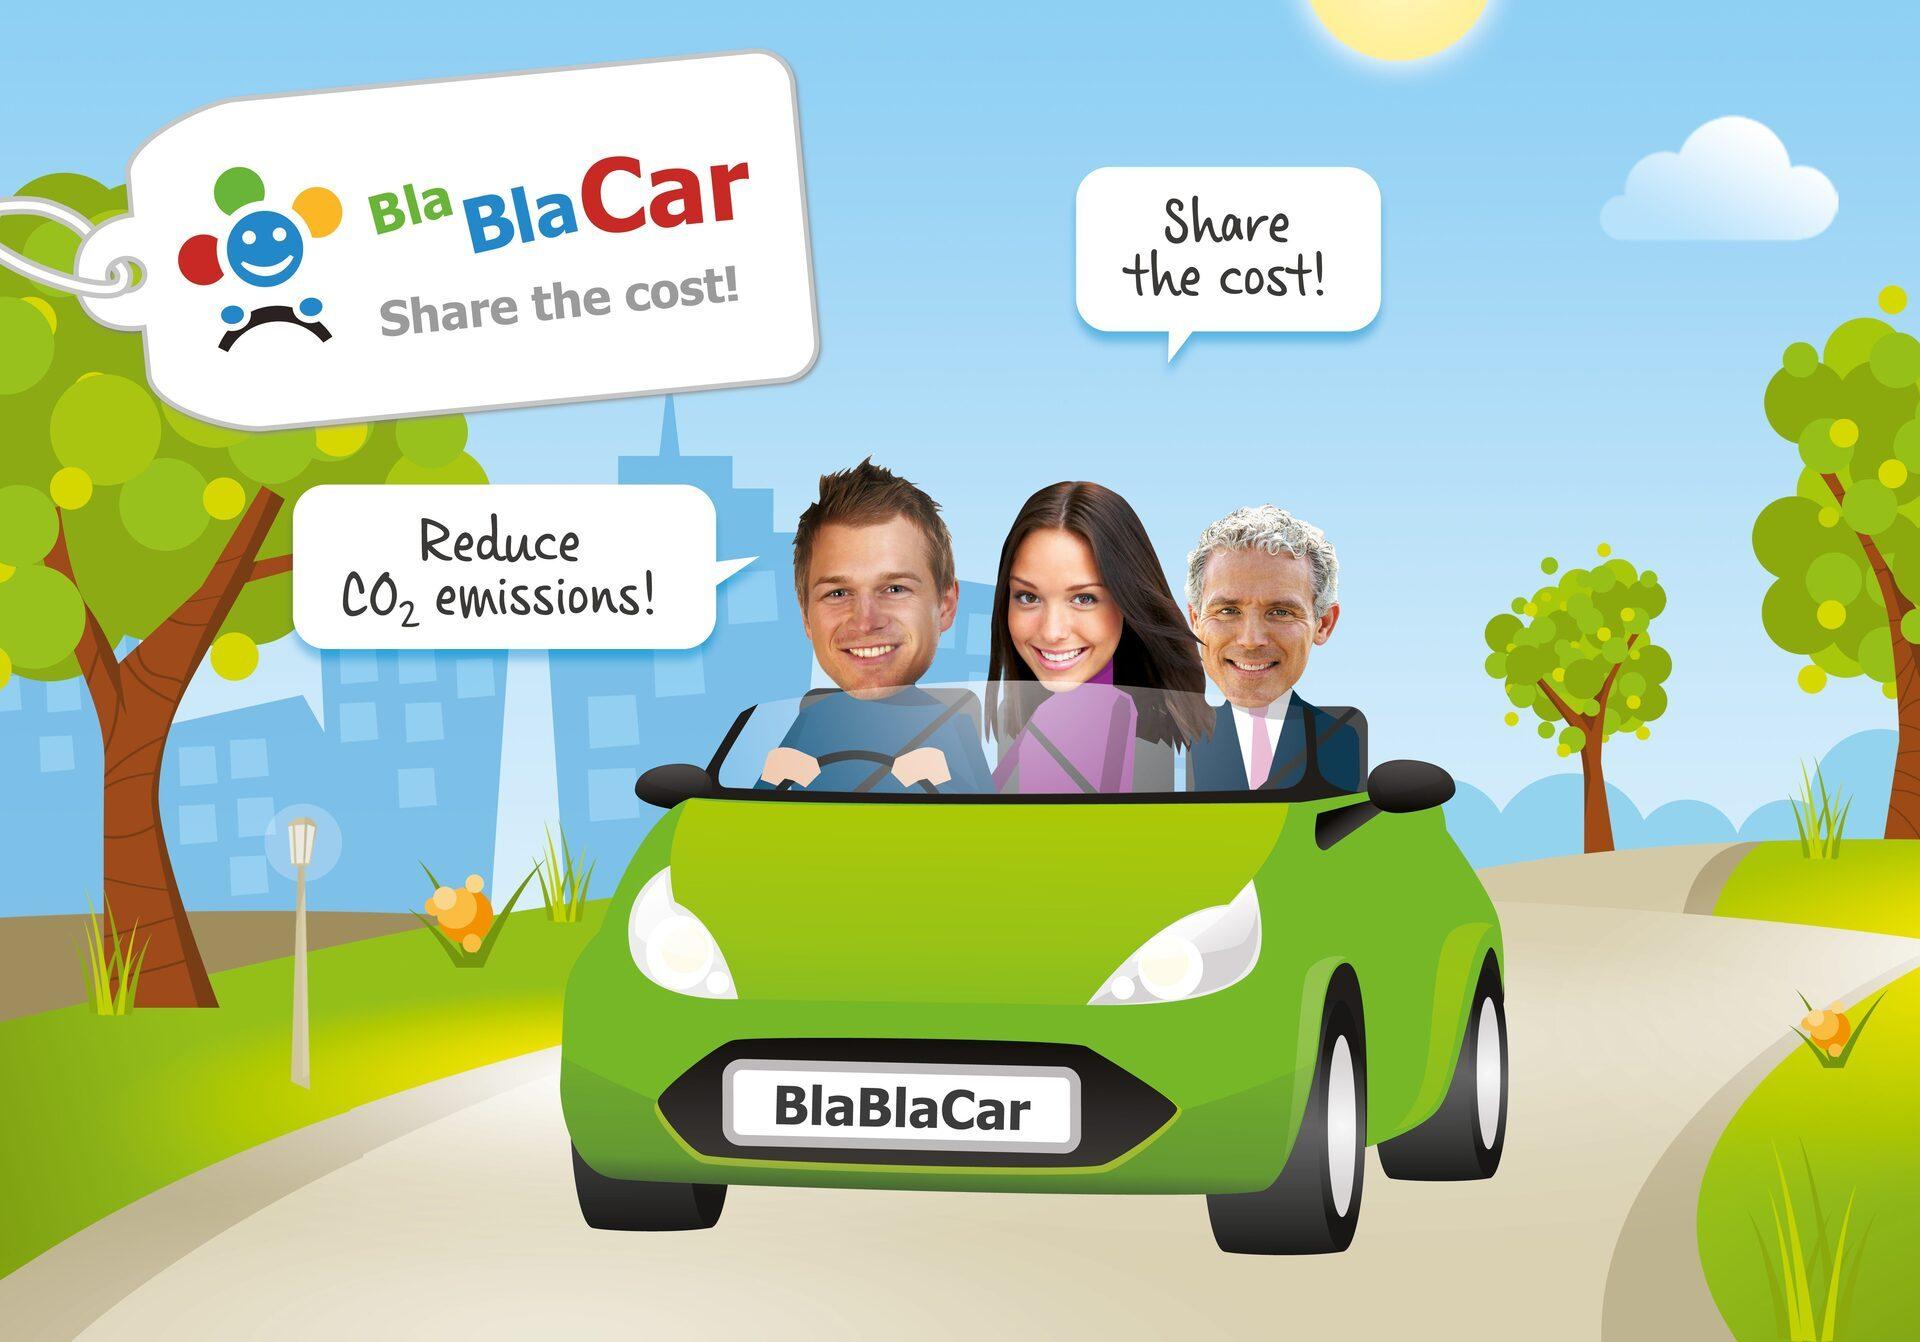 Bla bla car coupons